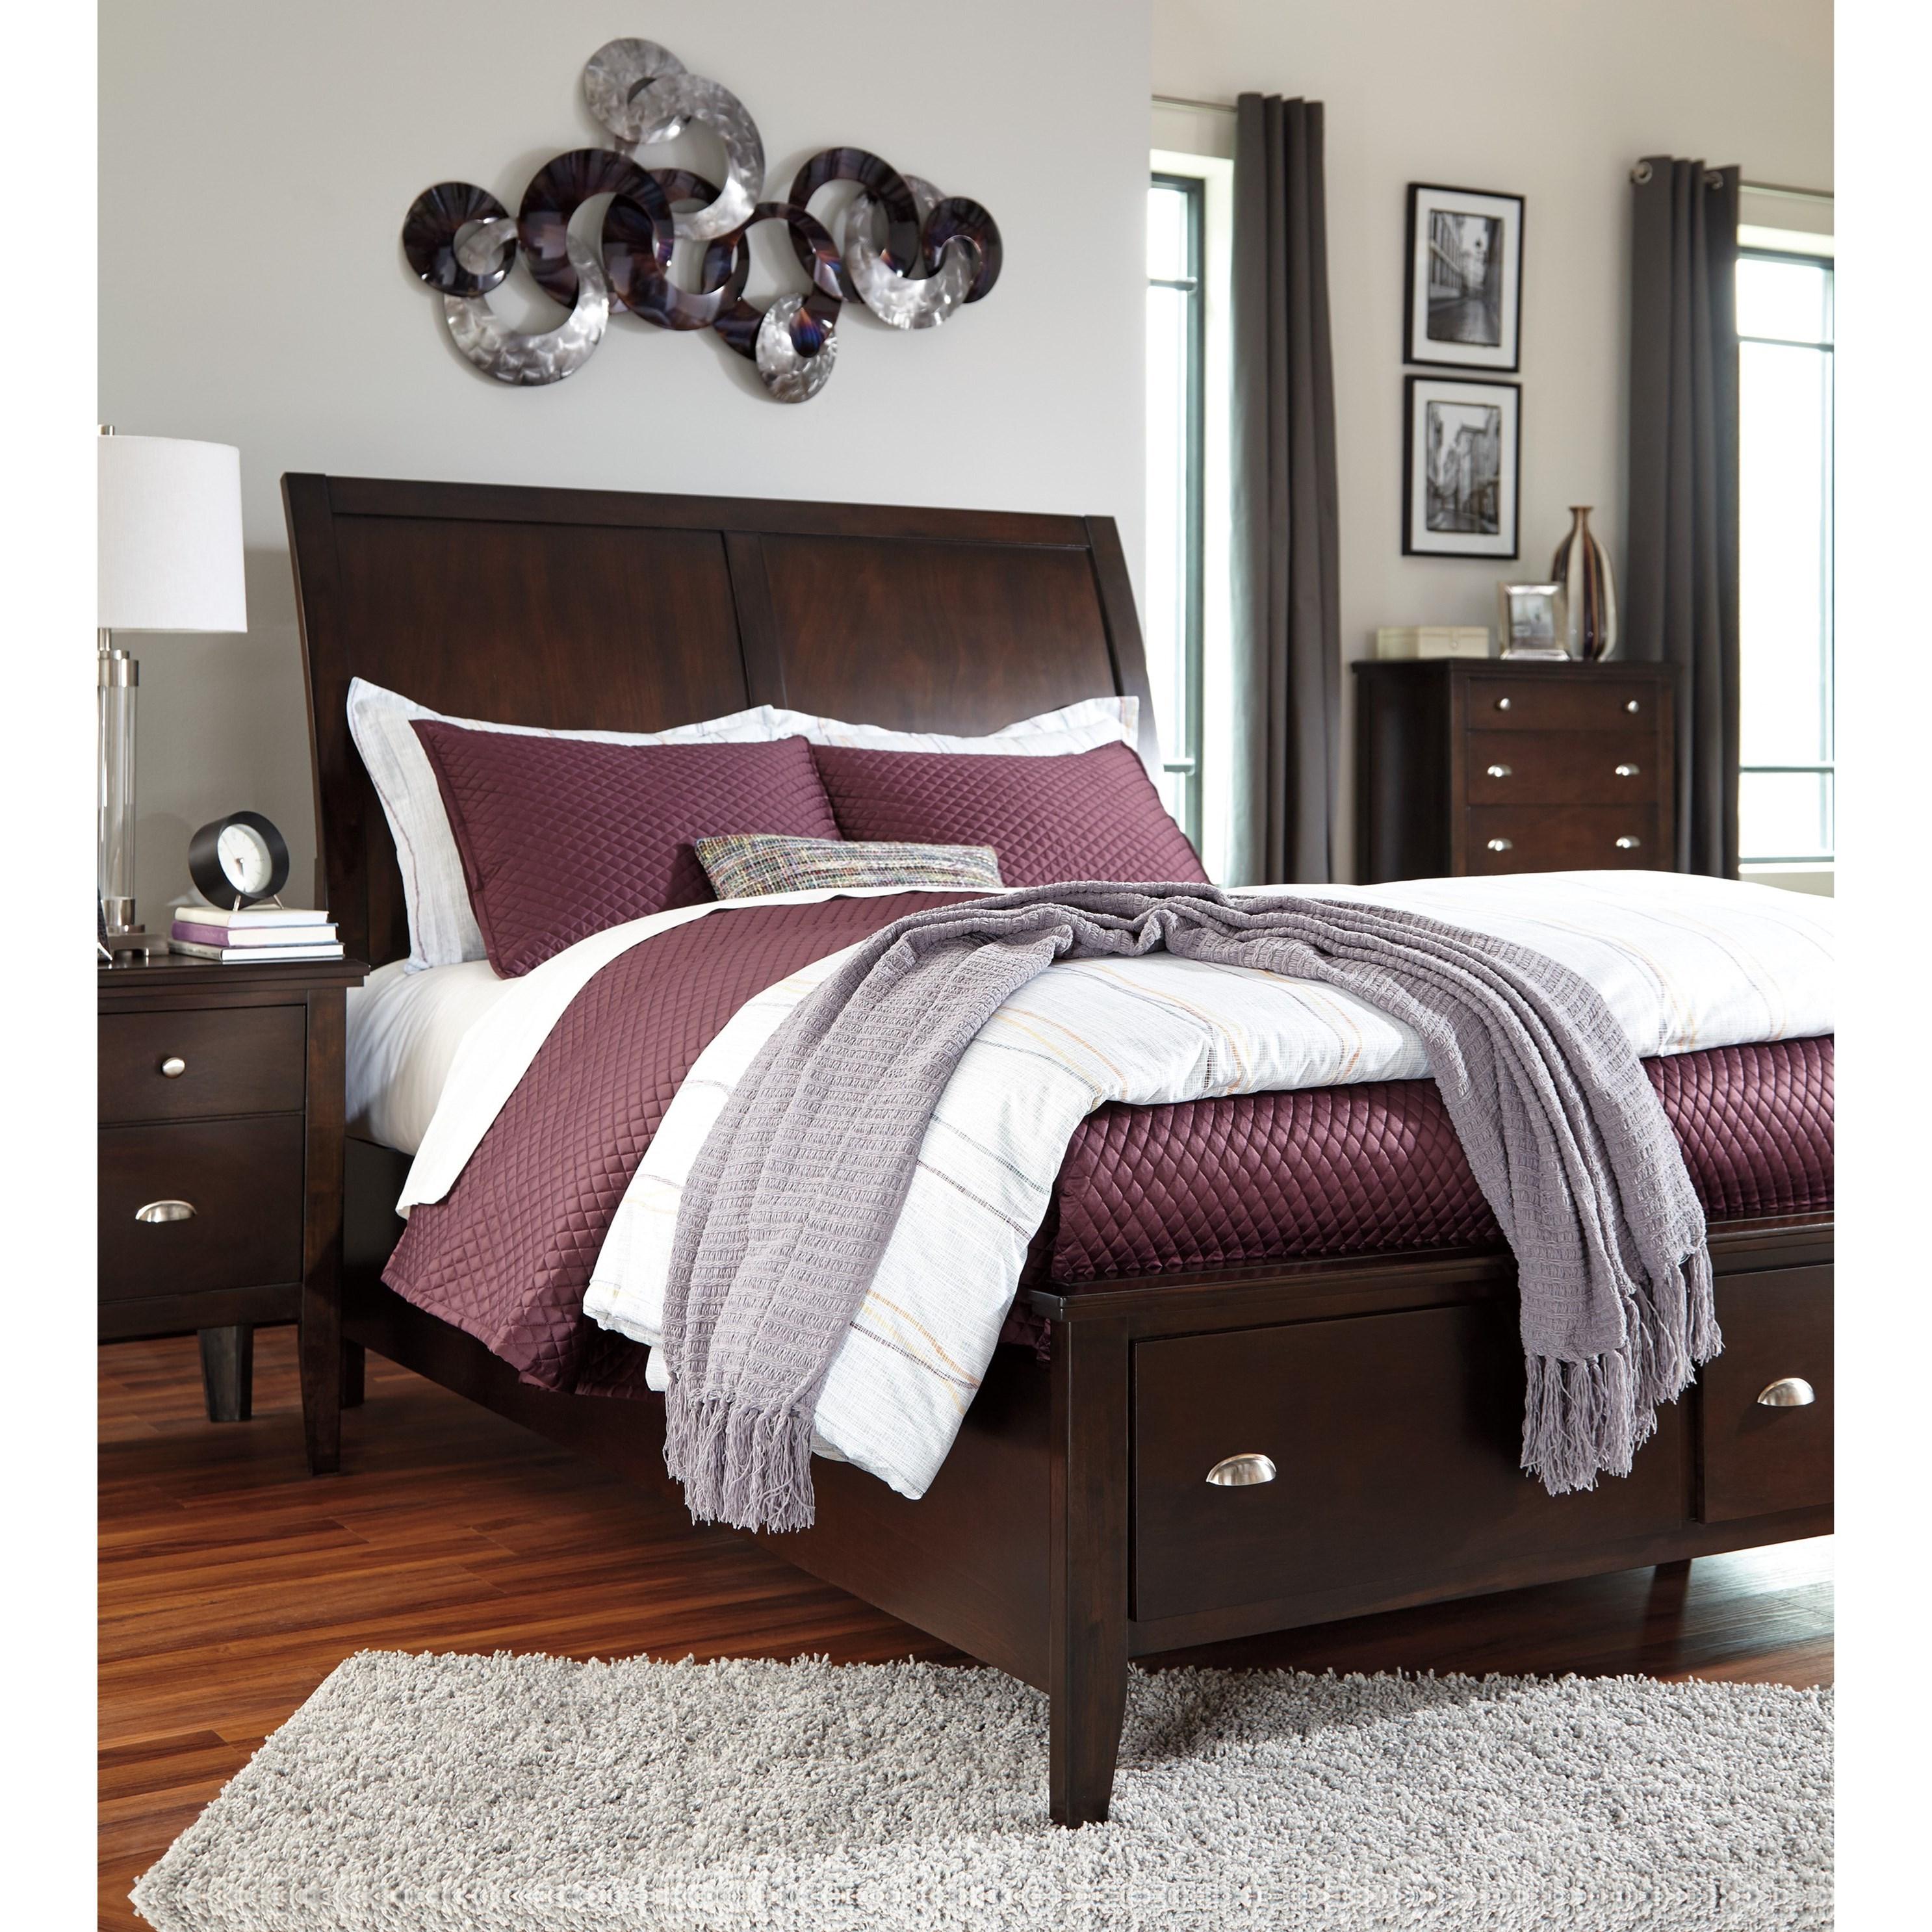 Signature Design By Ashley Evanburg Cherry Finish King Sleigh Storage Bed Beck 39 S Furniture